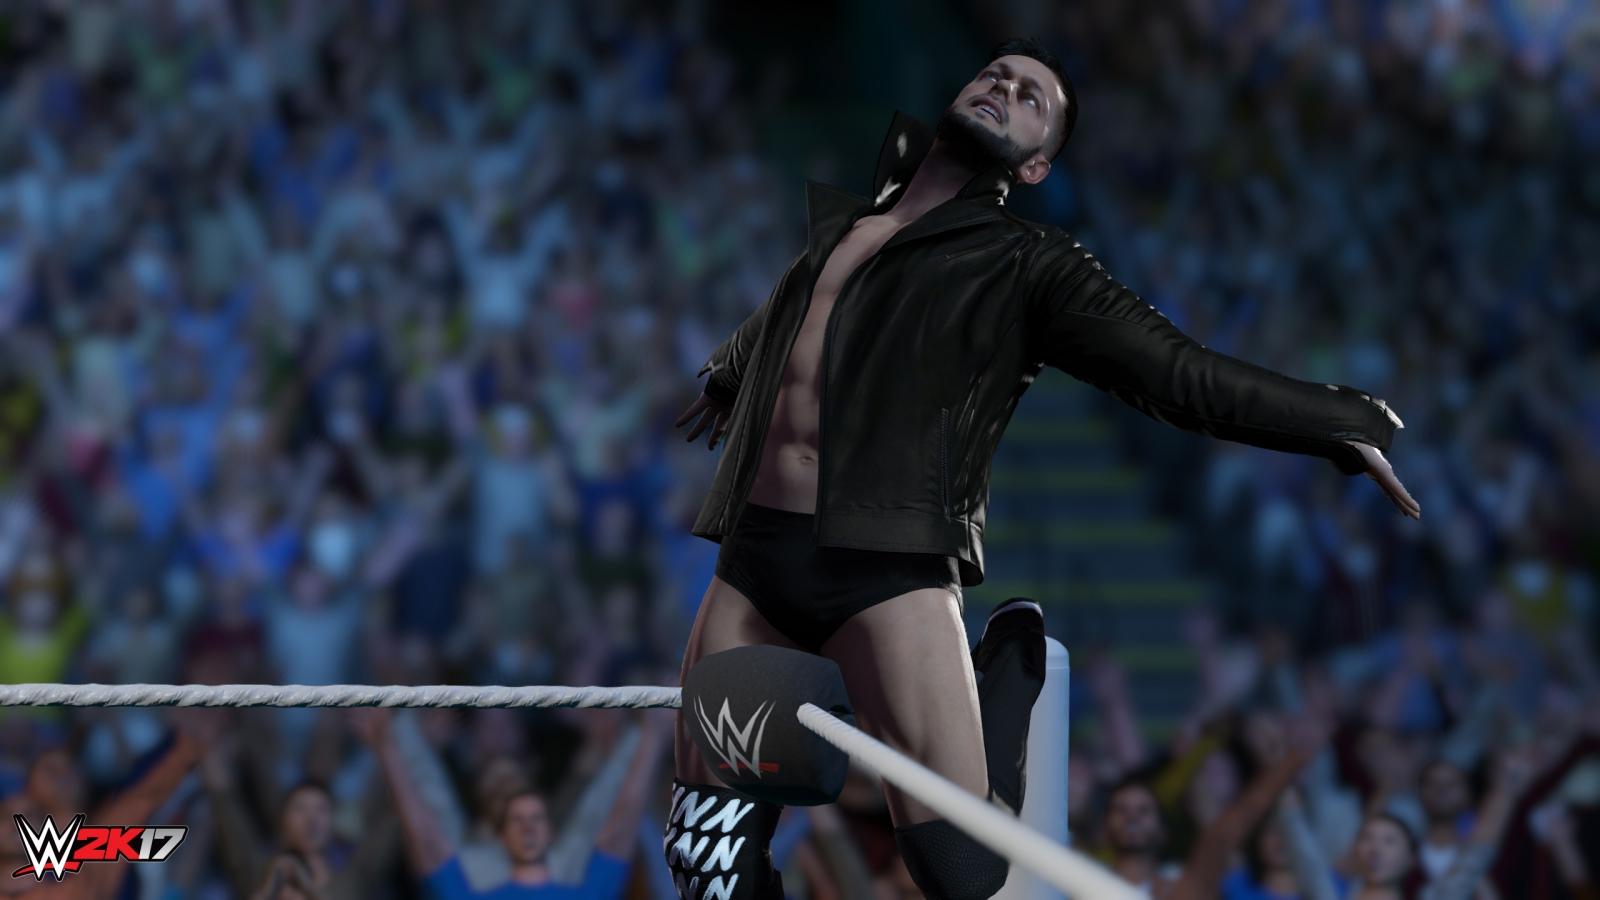 WWE 2K17 Finn Balor